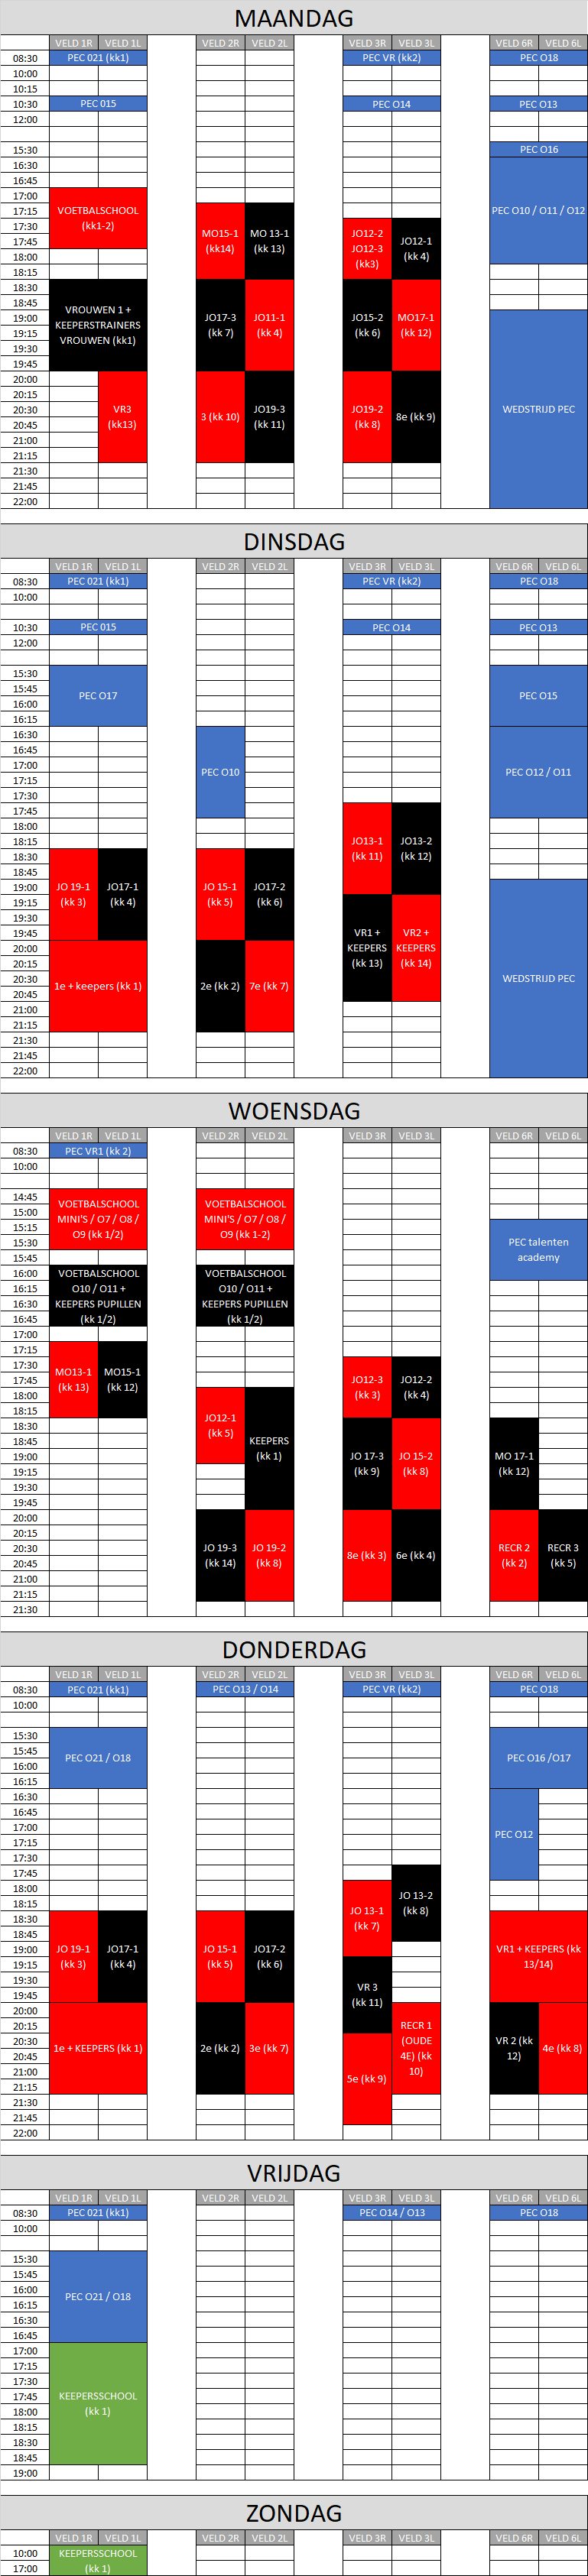 trainingsschema per 03-09-2021